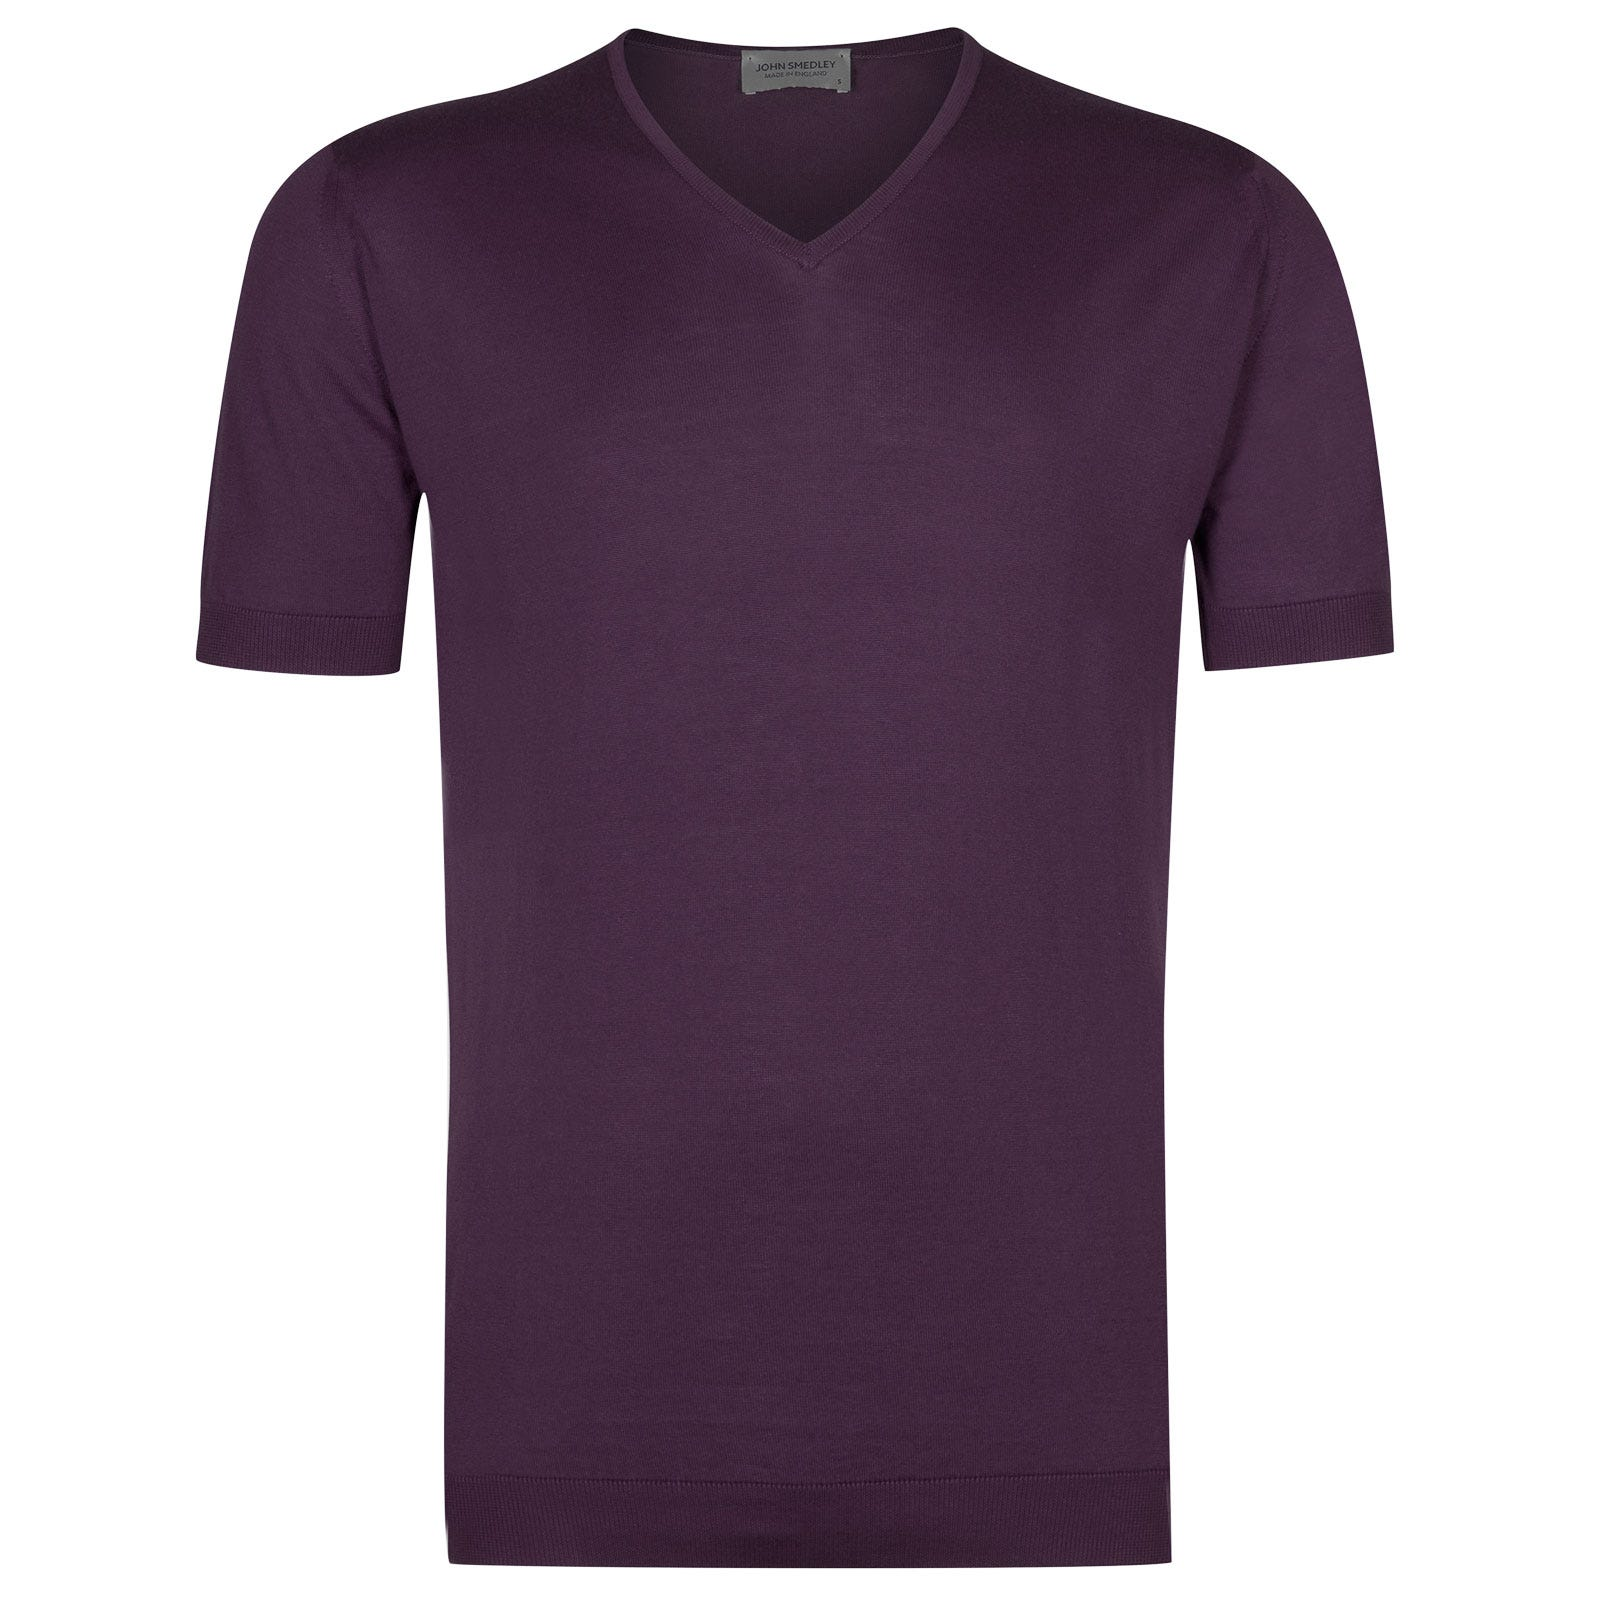 braedon-bauhaus-purple-Xxl